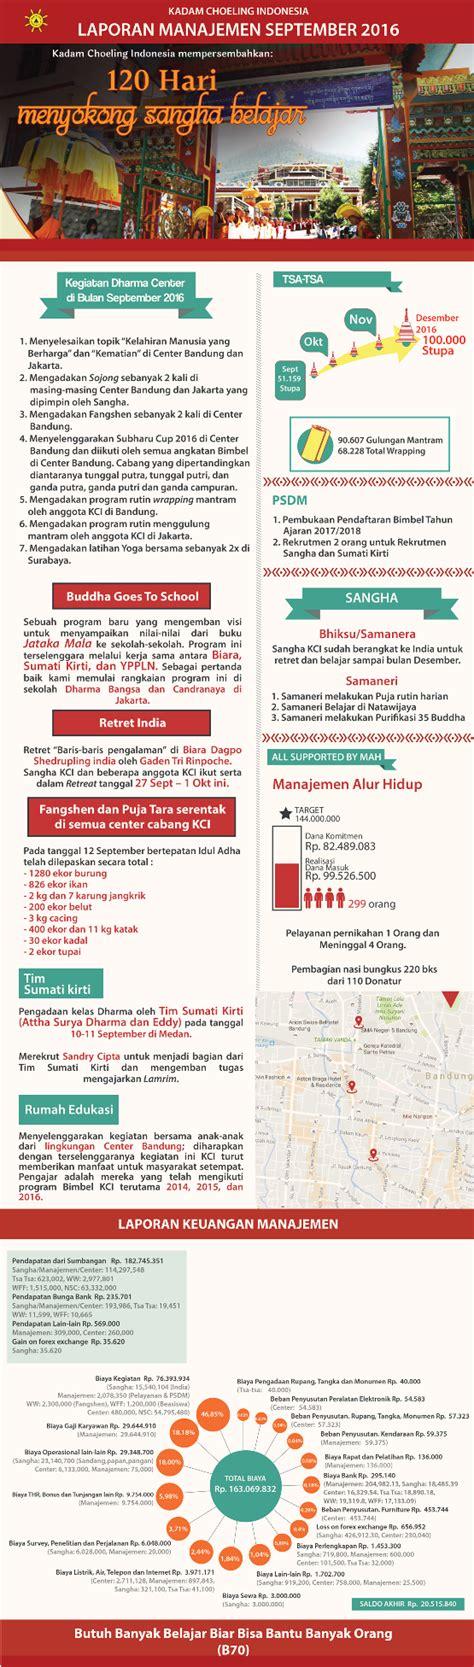 laporan manajemen layout laporan manajemen kadam choeling indonesia september